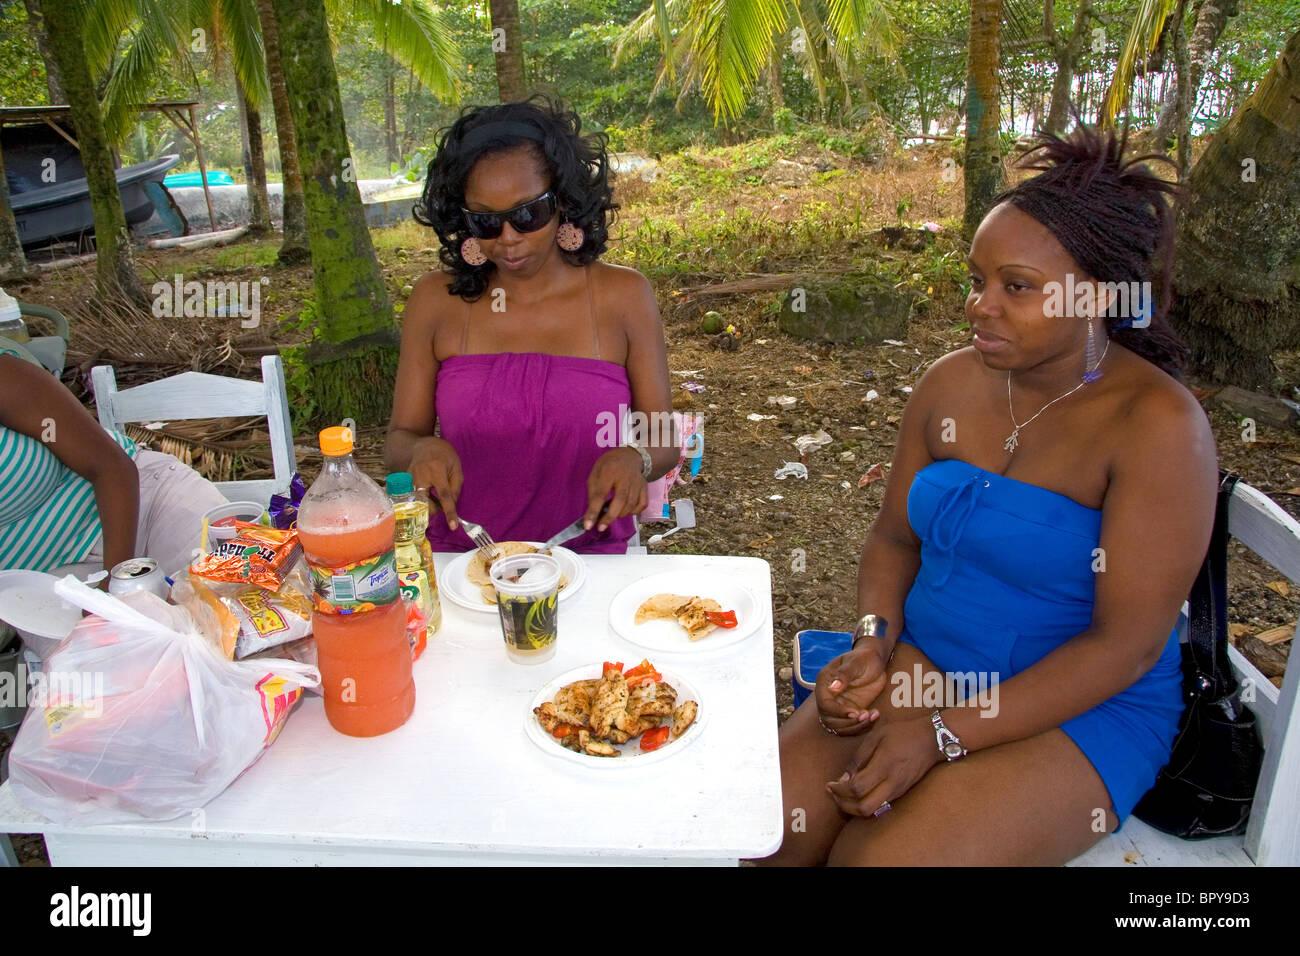 Afro-caribbean women having a picnic at Puerto Limon, Costa Rica. - Stock Image